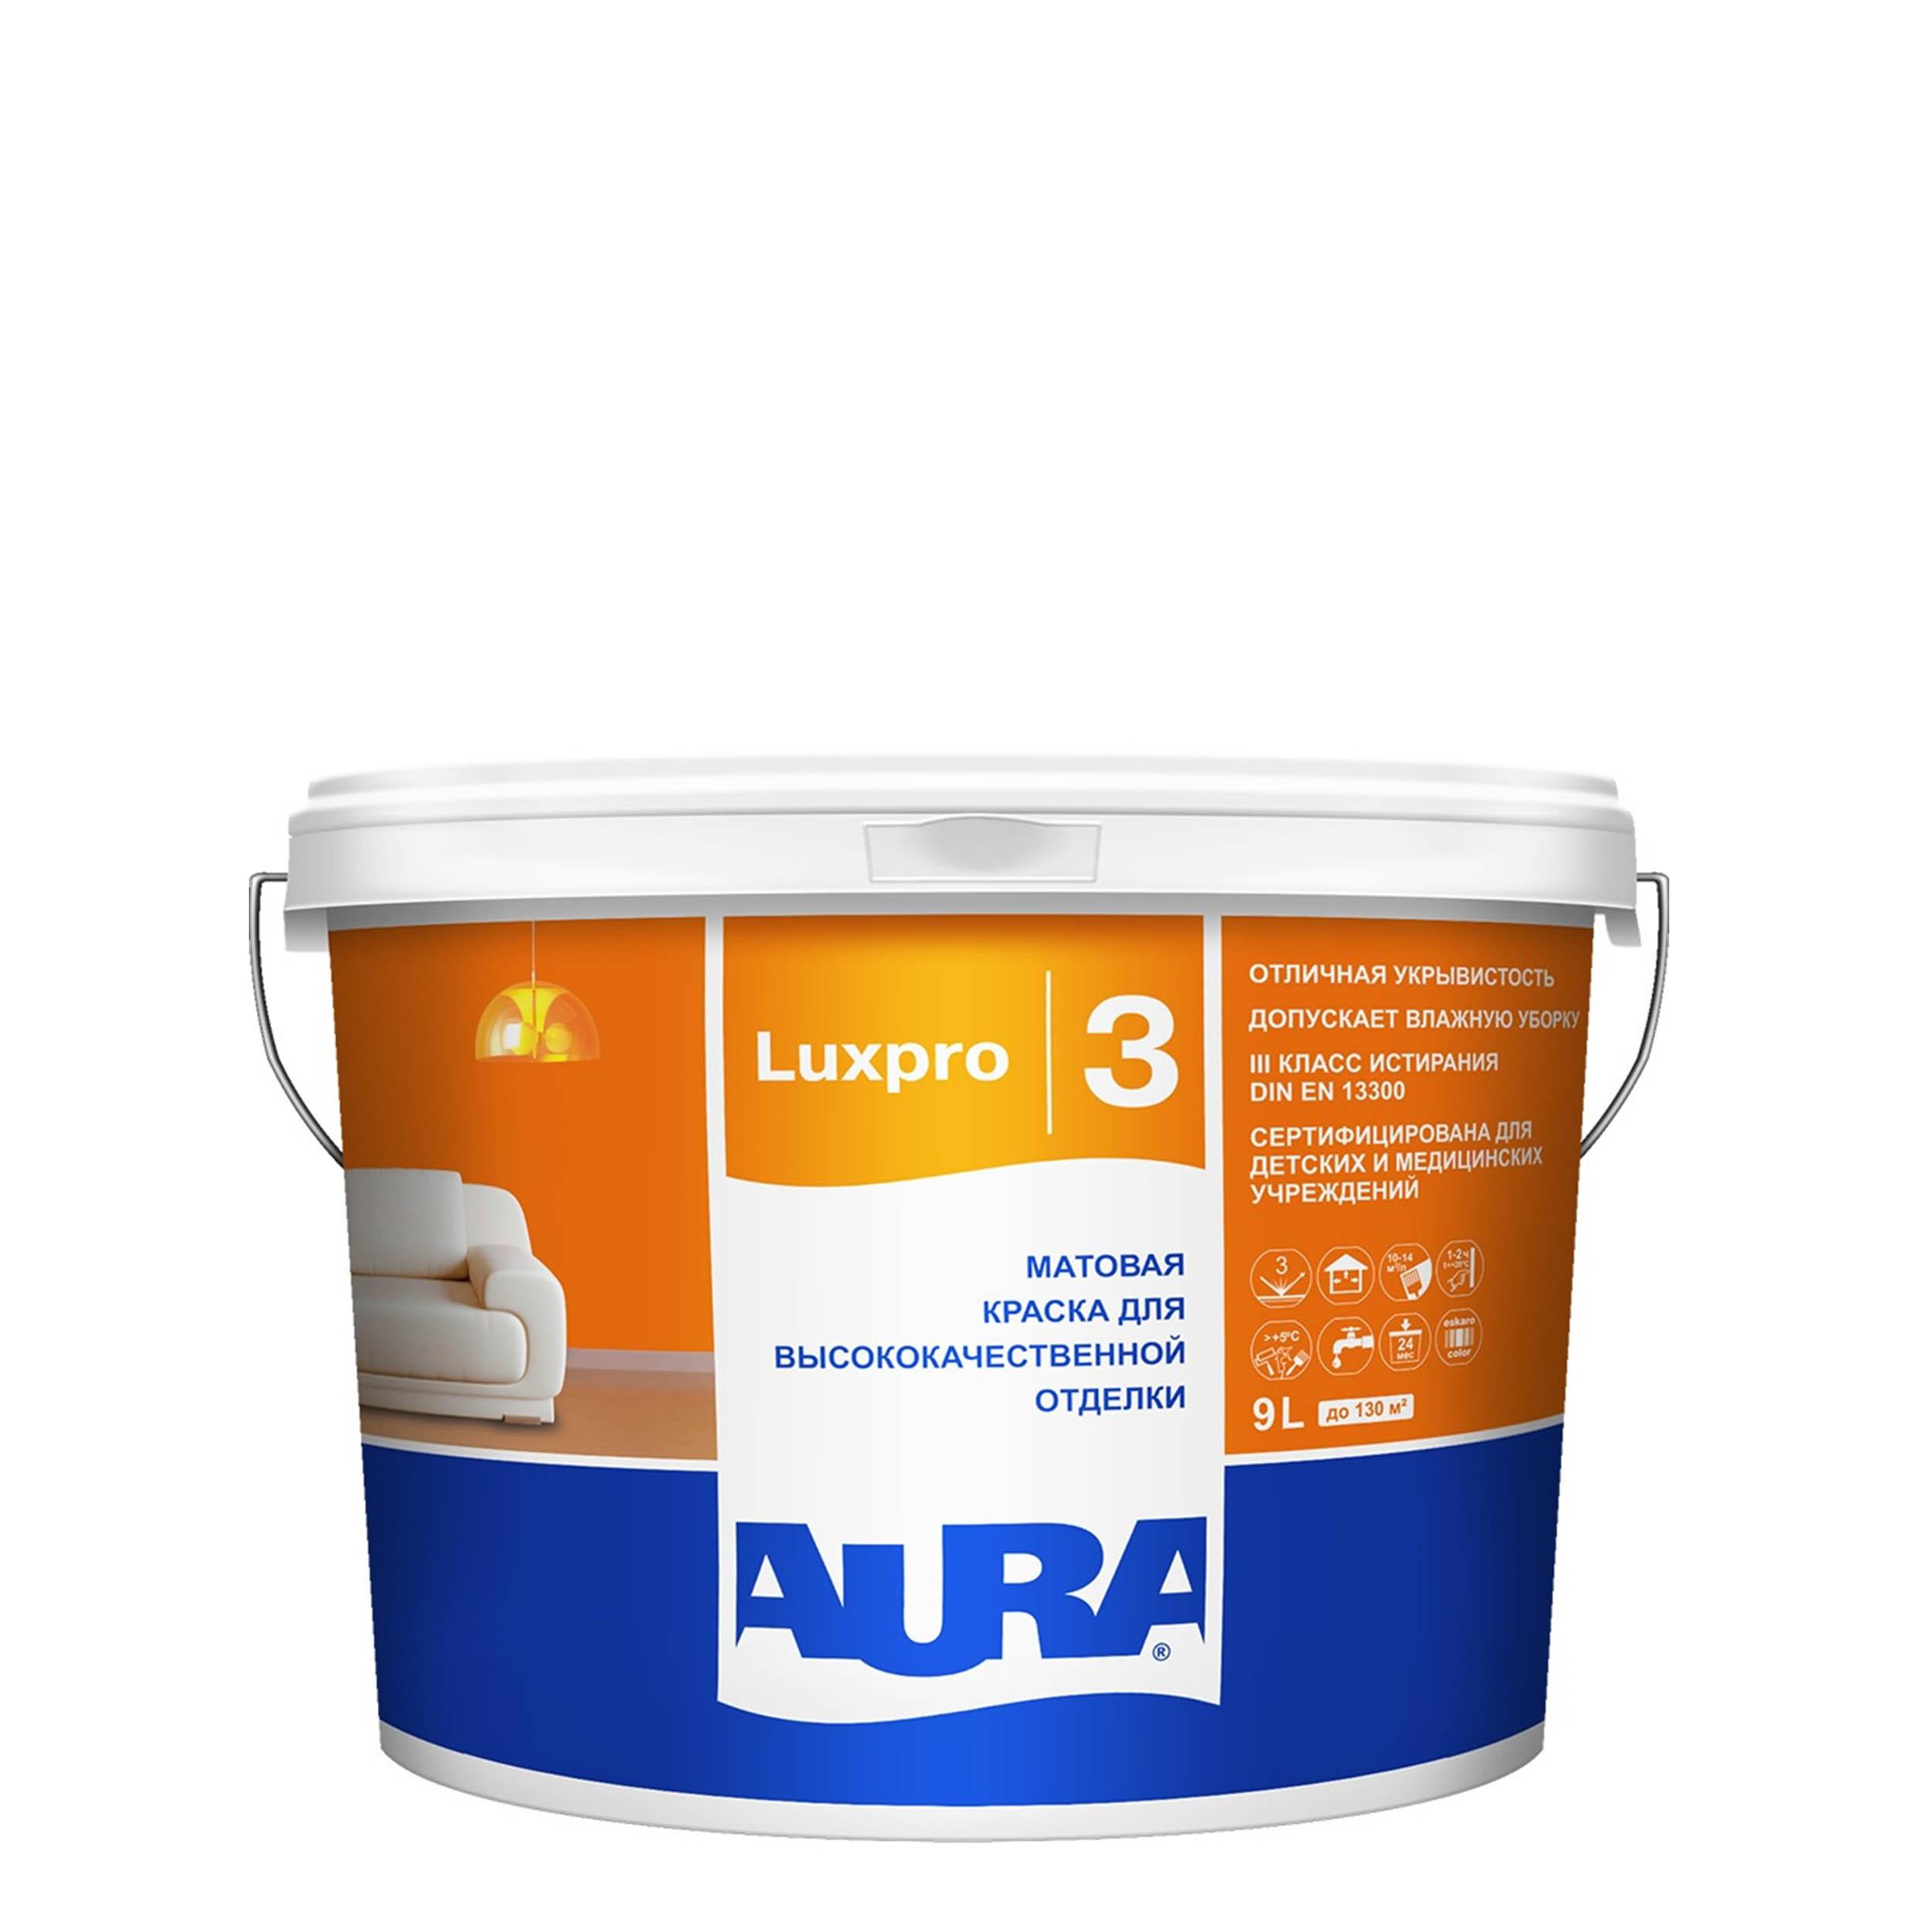 Фото 3 - Краска интерьерная, Aura LuxPRO 3, RAL 7003, 11 кг.